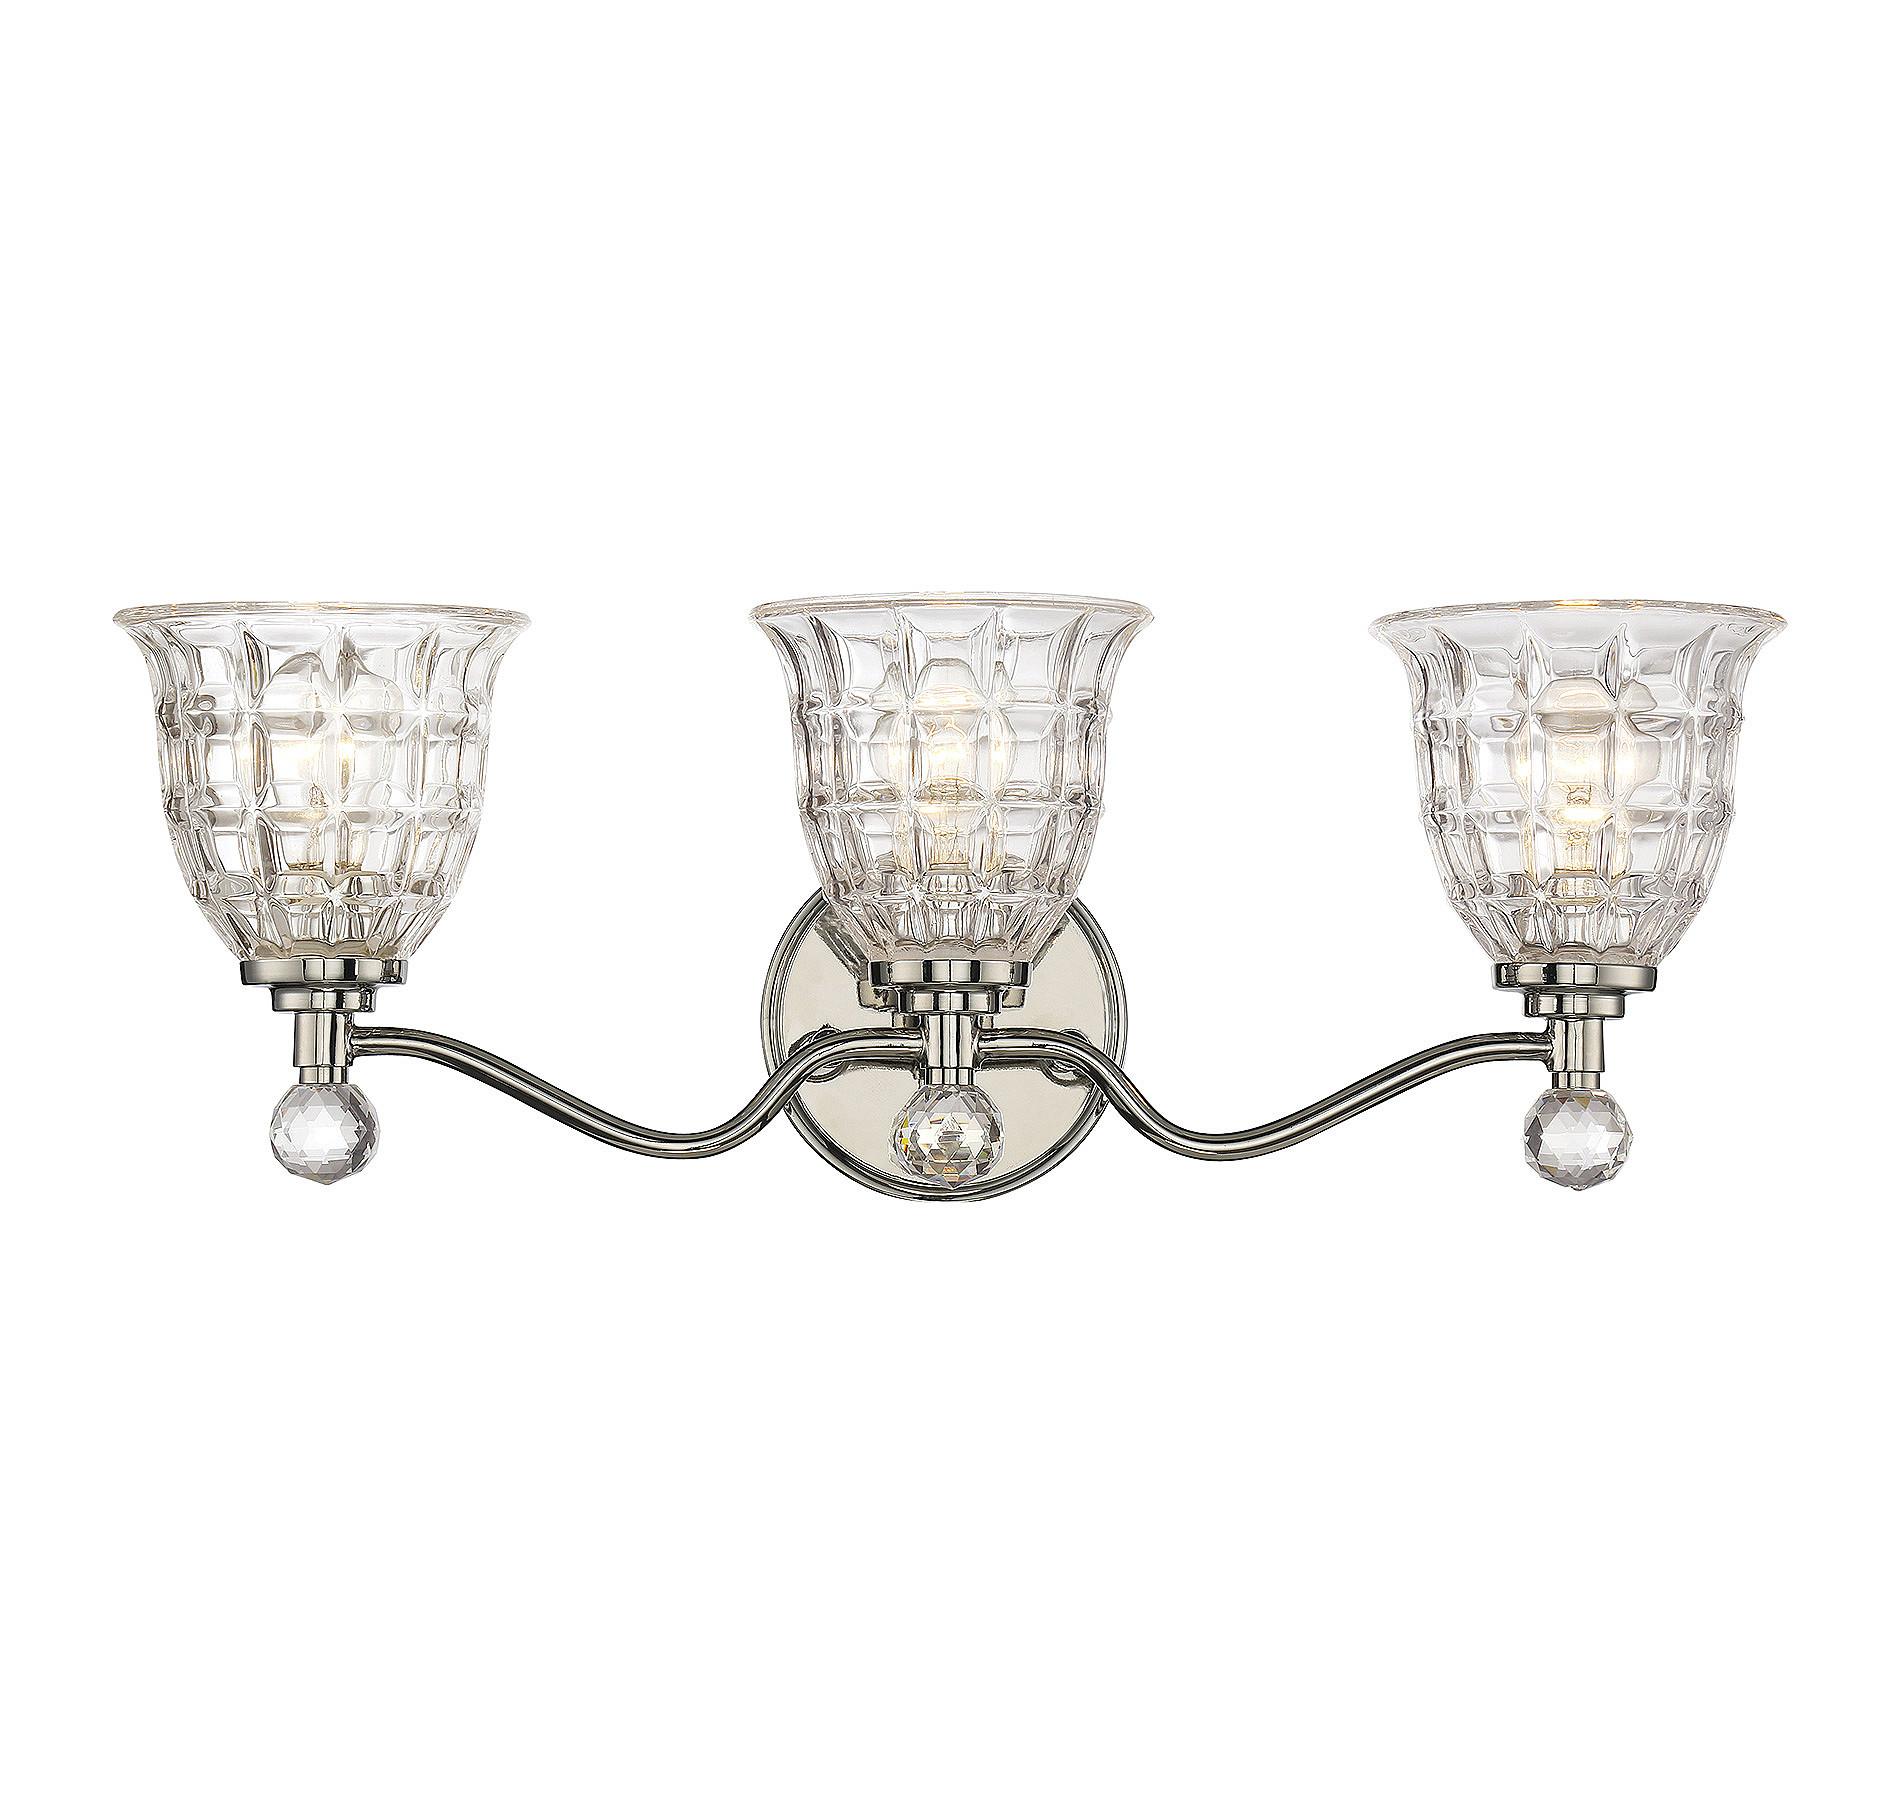 Savoy House 8 880 3 109 Birone 3 Light Bathroom Vanity